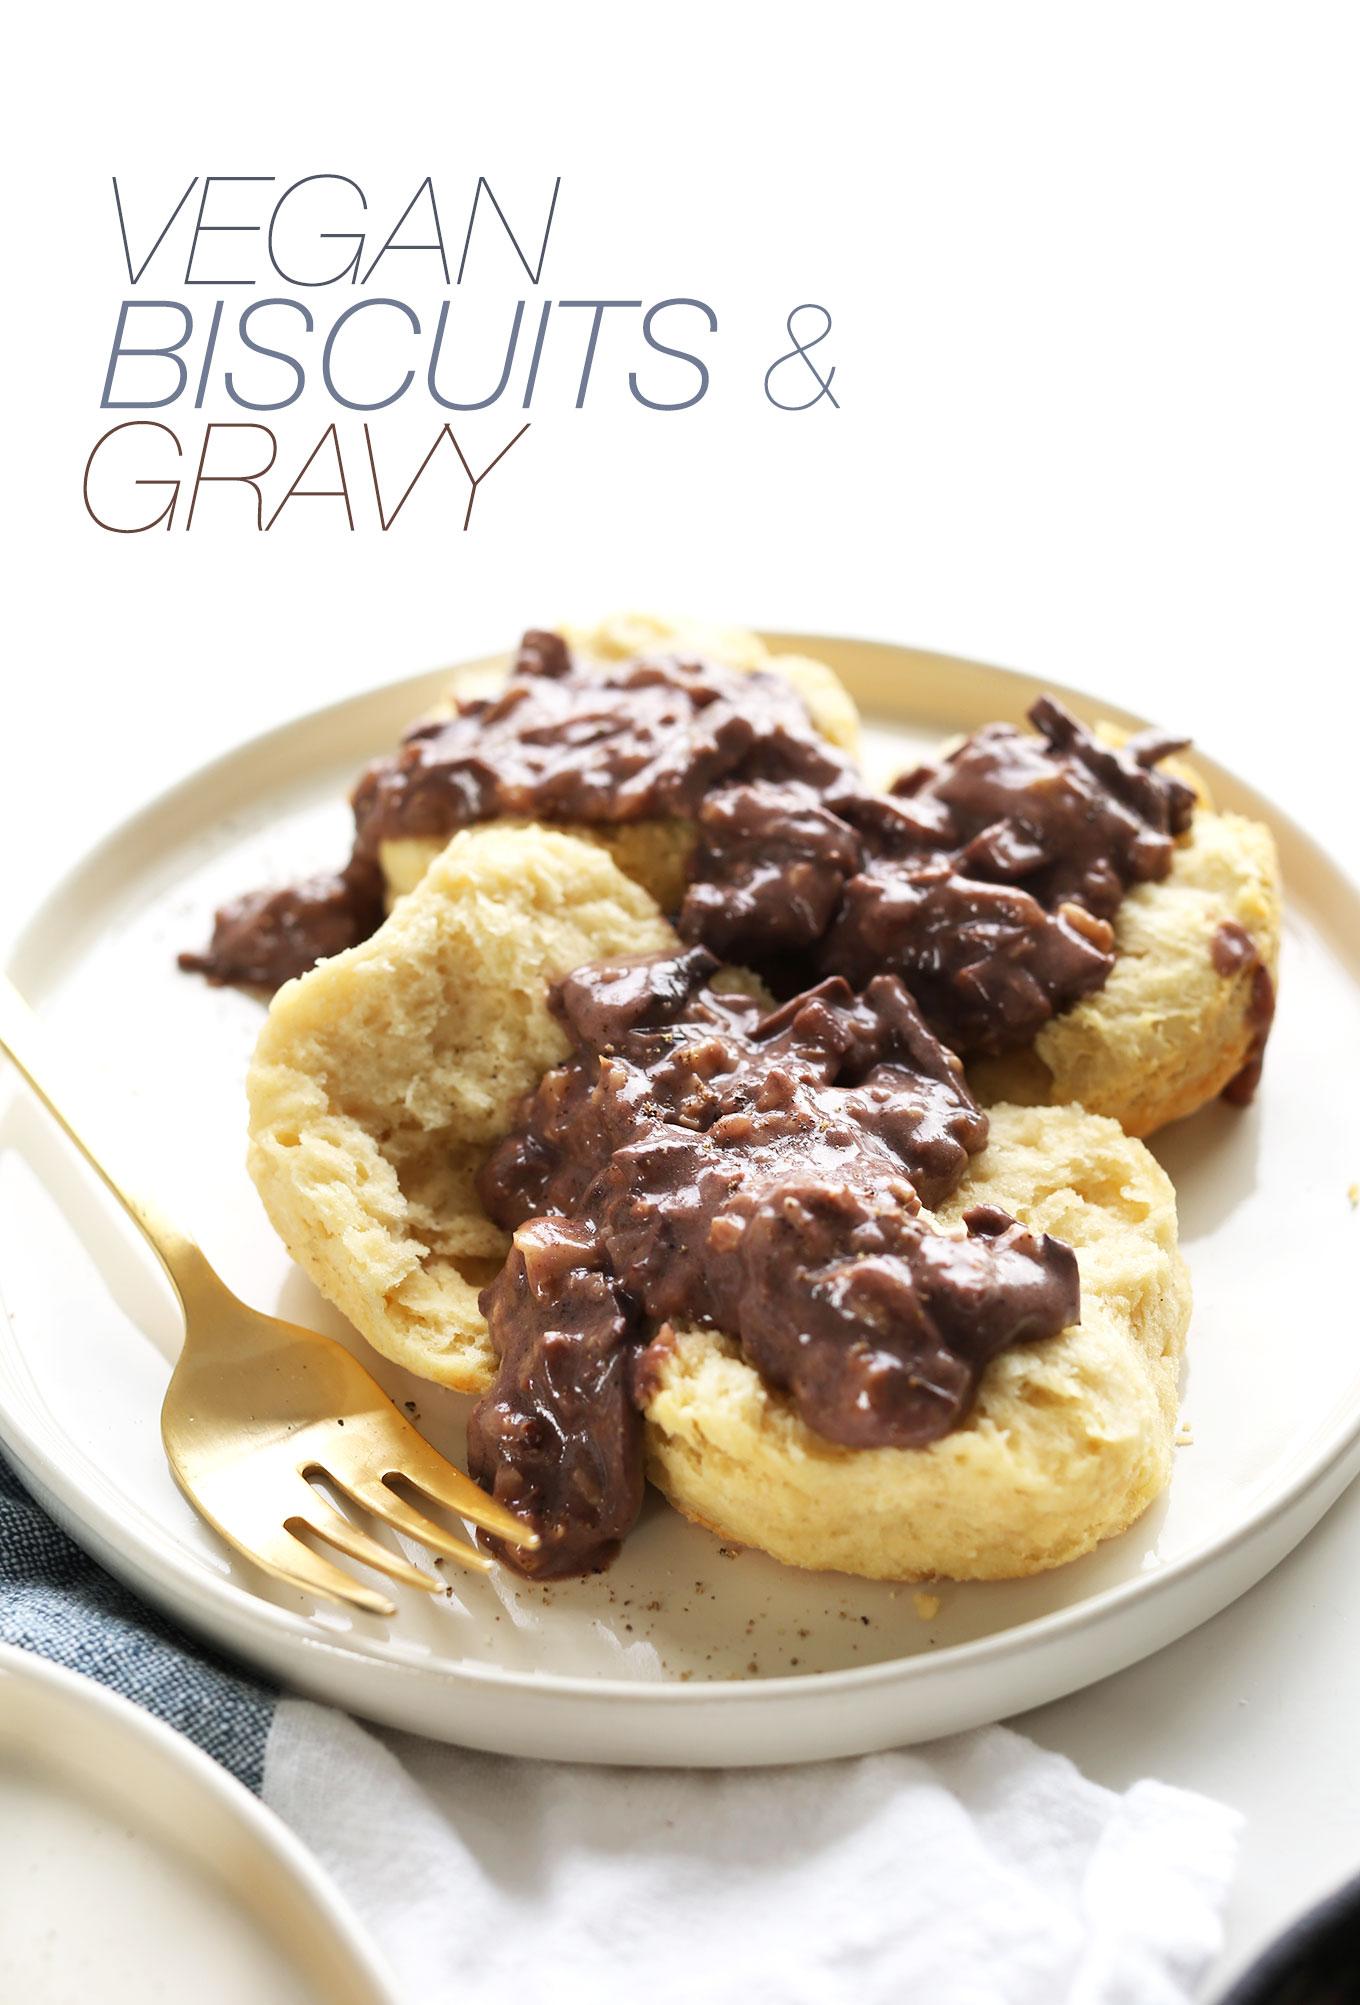 30-MINUTE Vegan Biscuits and Gravy! Flaky #vegan biscuits and peppery mushroom walnut gravy! #breakfast #minimalistbaker